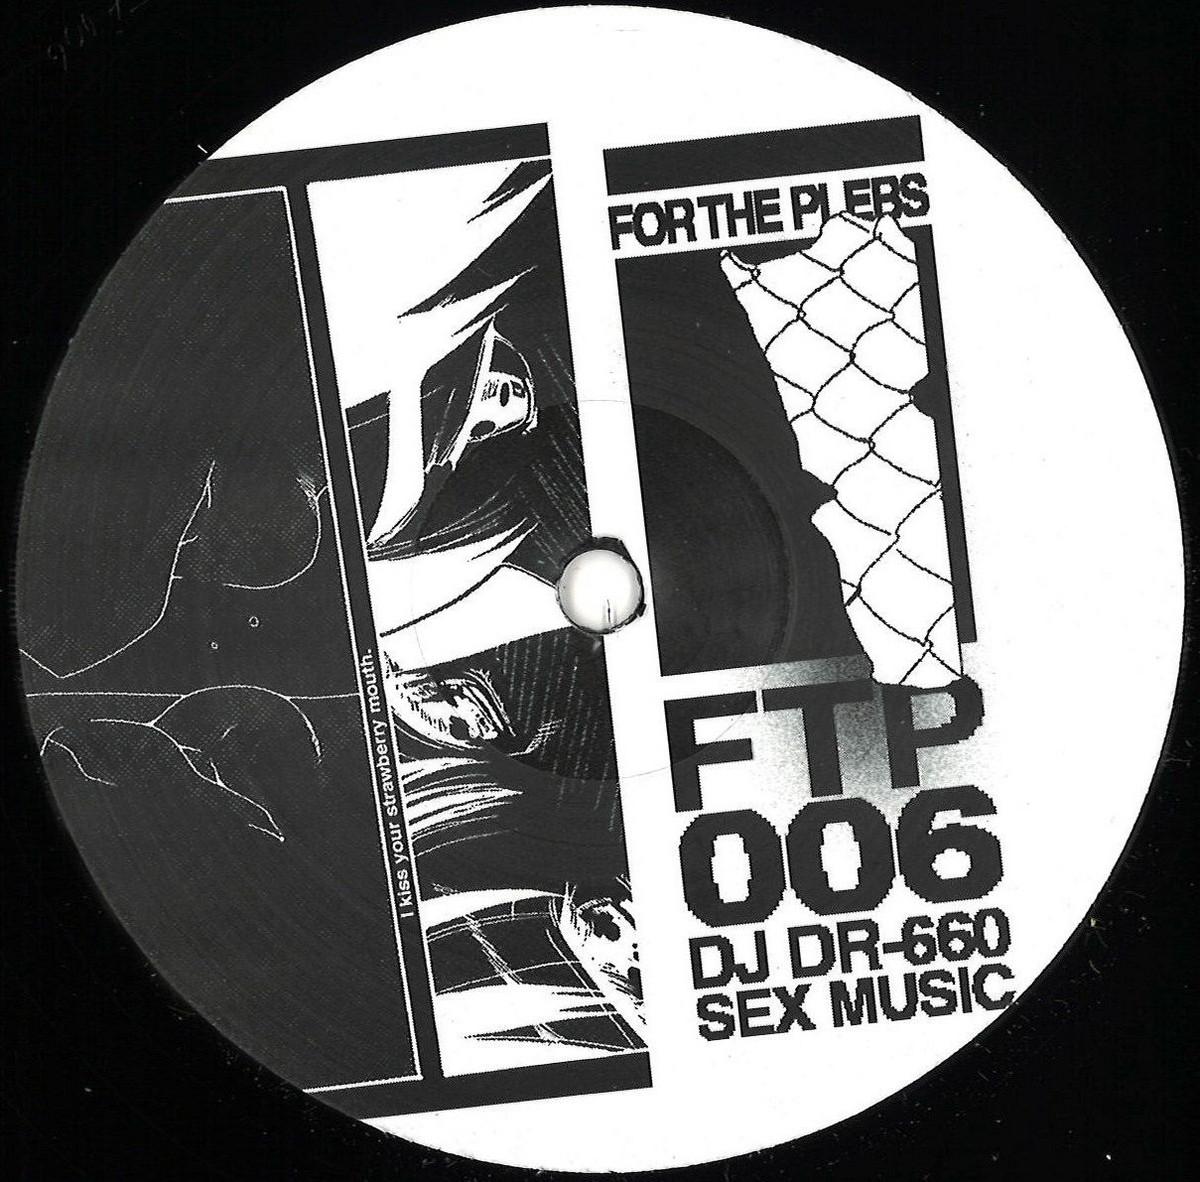 Black Sex Music